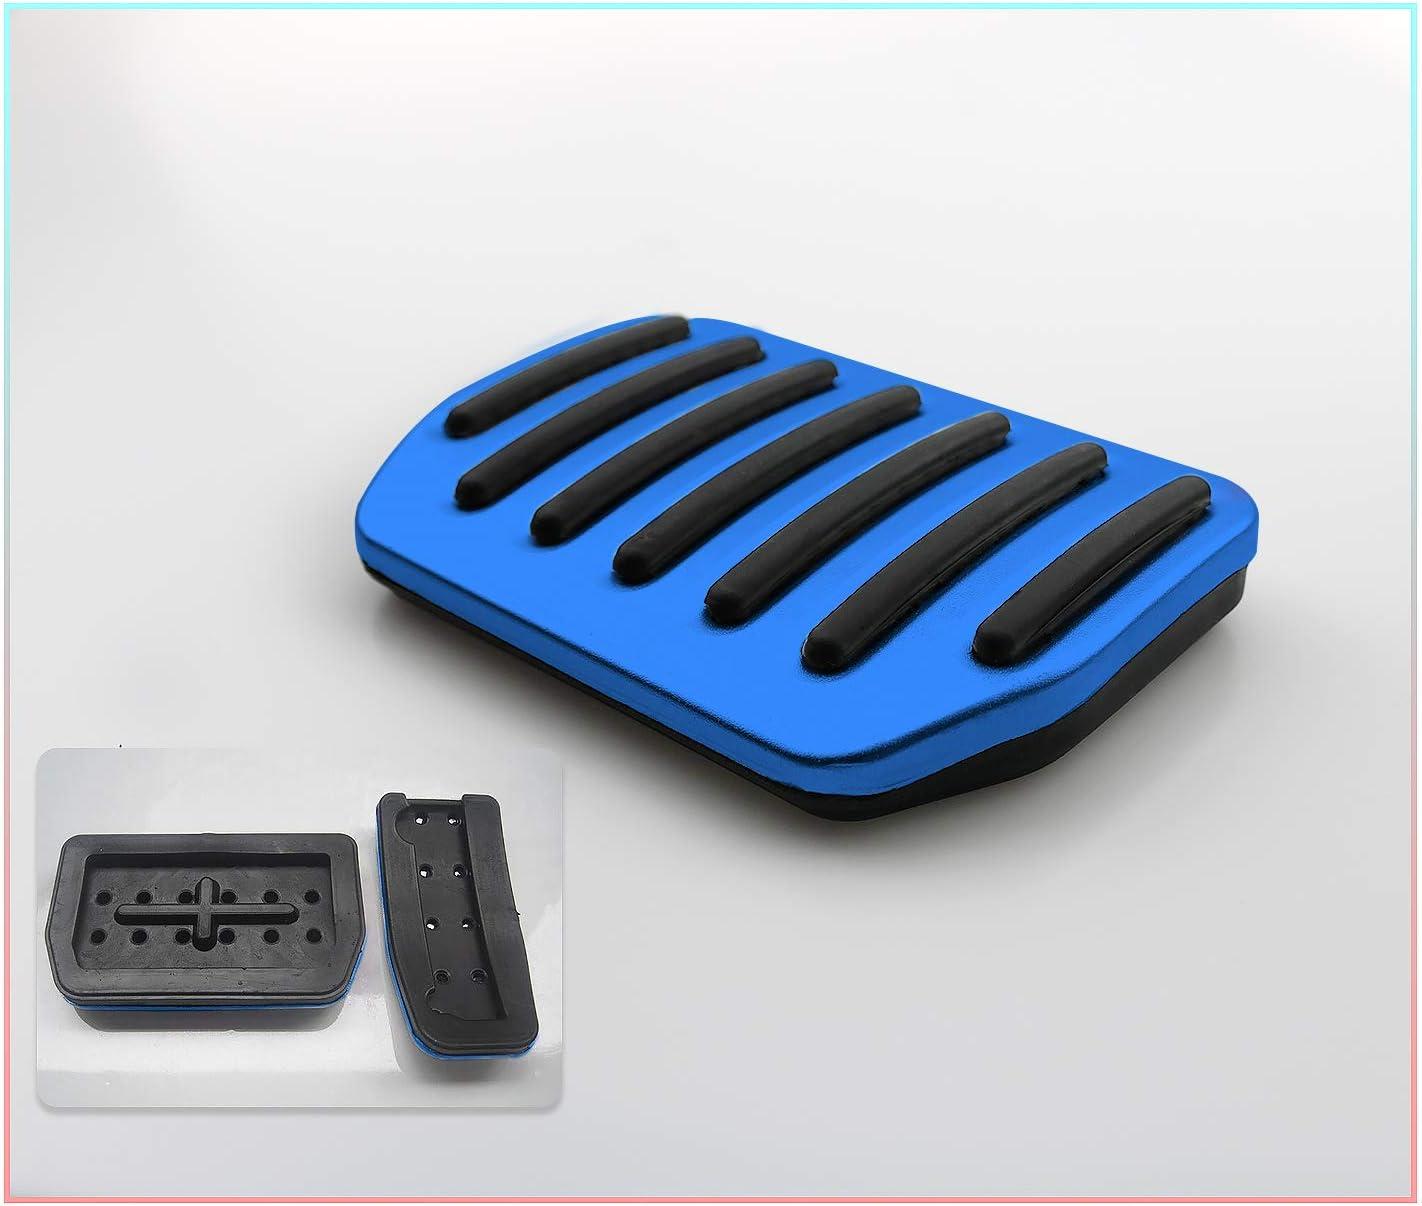 Cdefg Für Model 3 Auto Bremse Gaspeda Aluminiumlegierung Fußstütze Anti Rutsch Bremse Pedalkappen Silber Auto